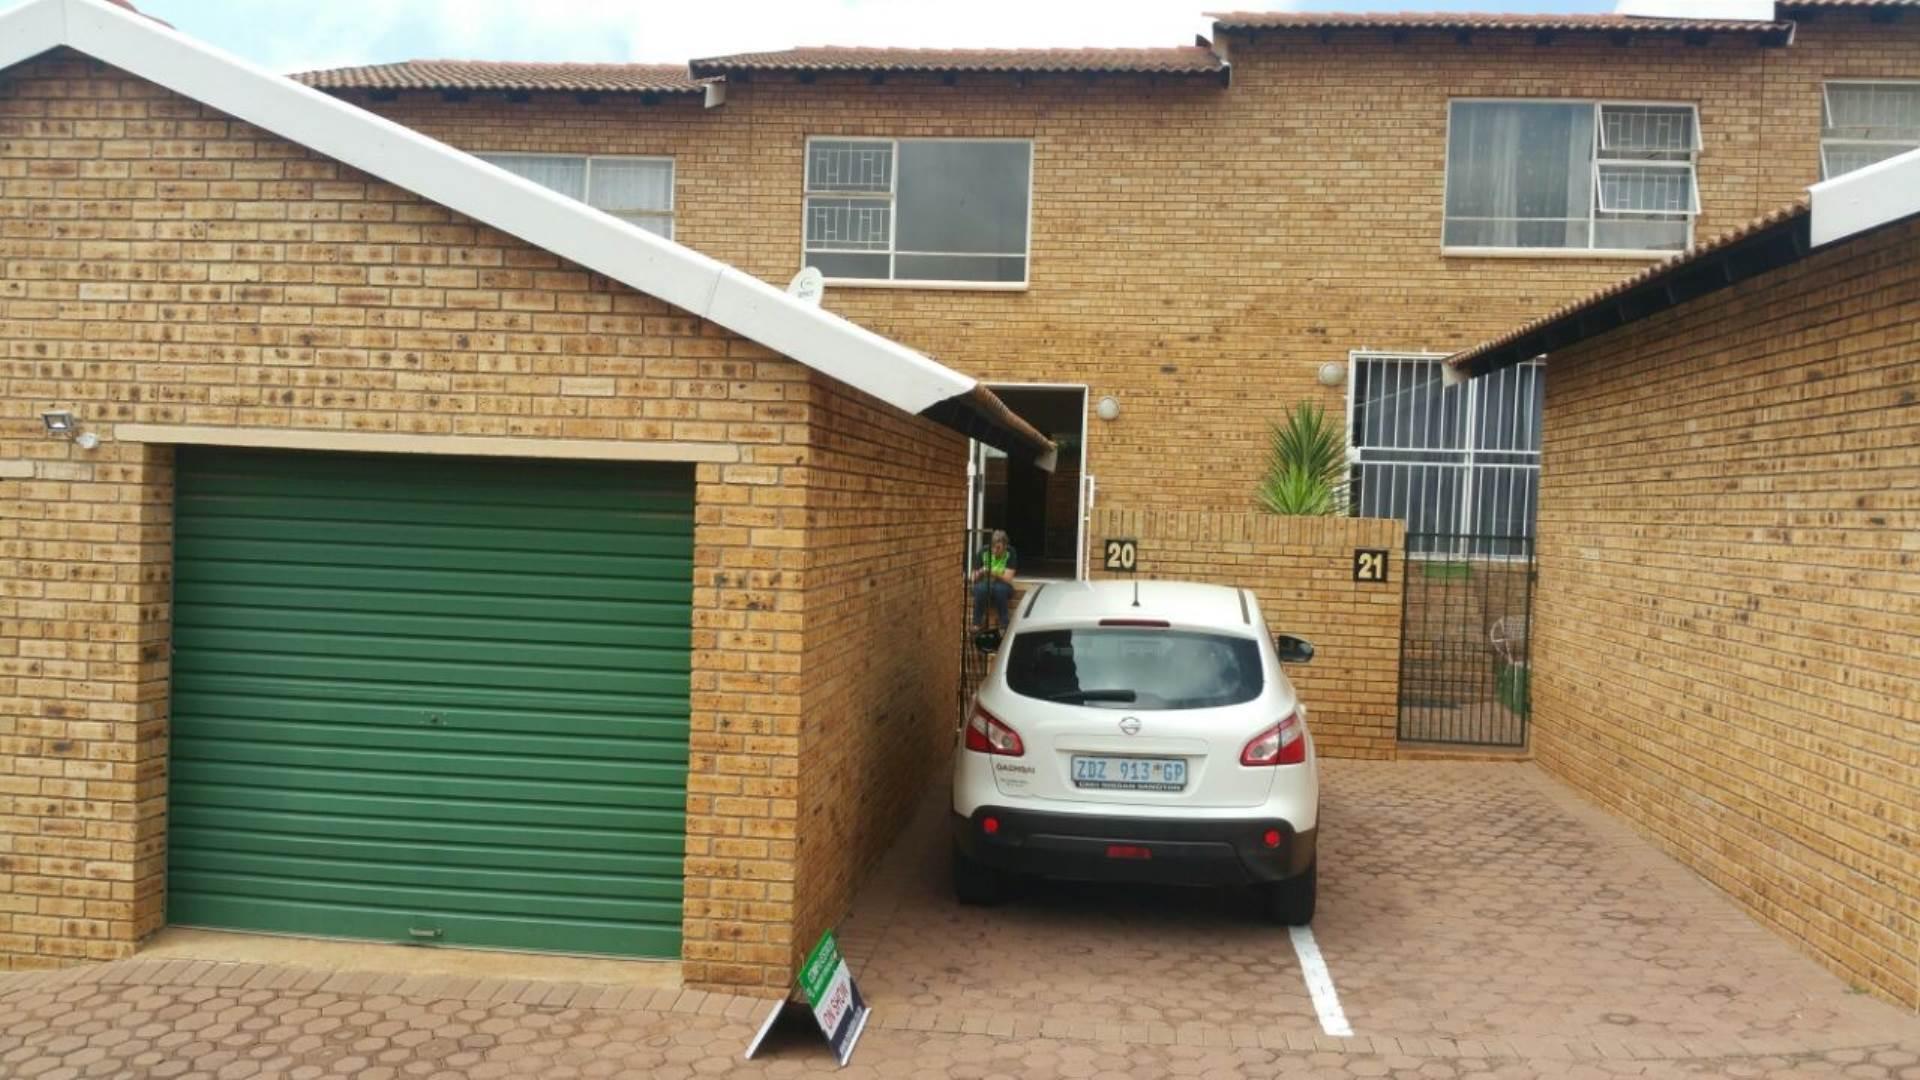 2 BedroomApartment For Sale In Rangeview